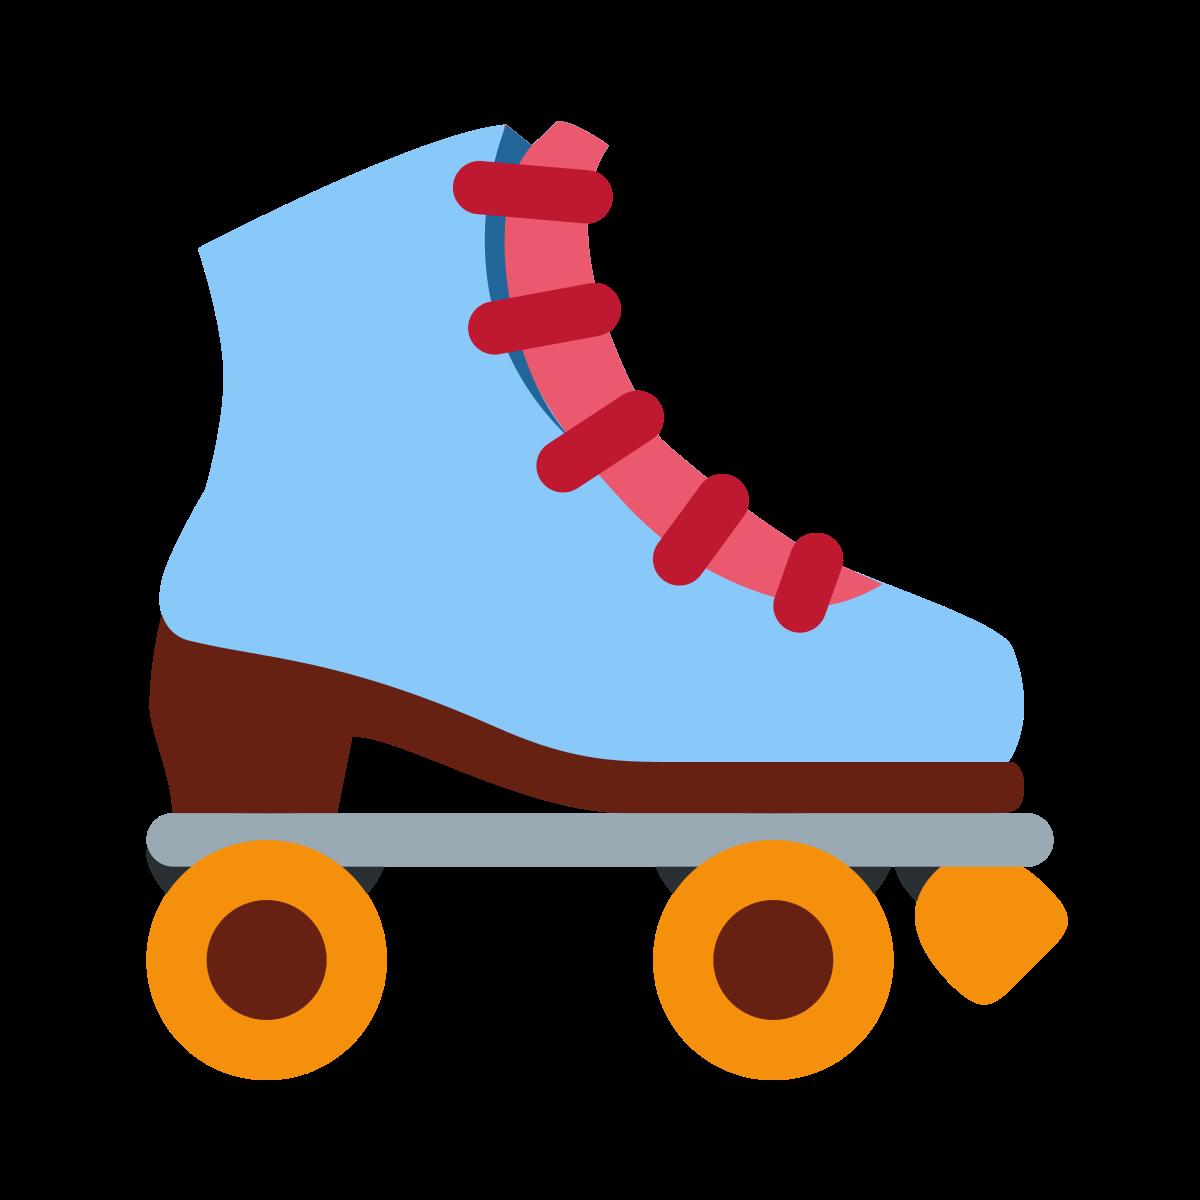 Roller Skate Emoji - What Emoji 🧐